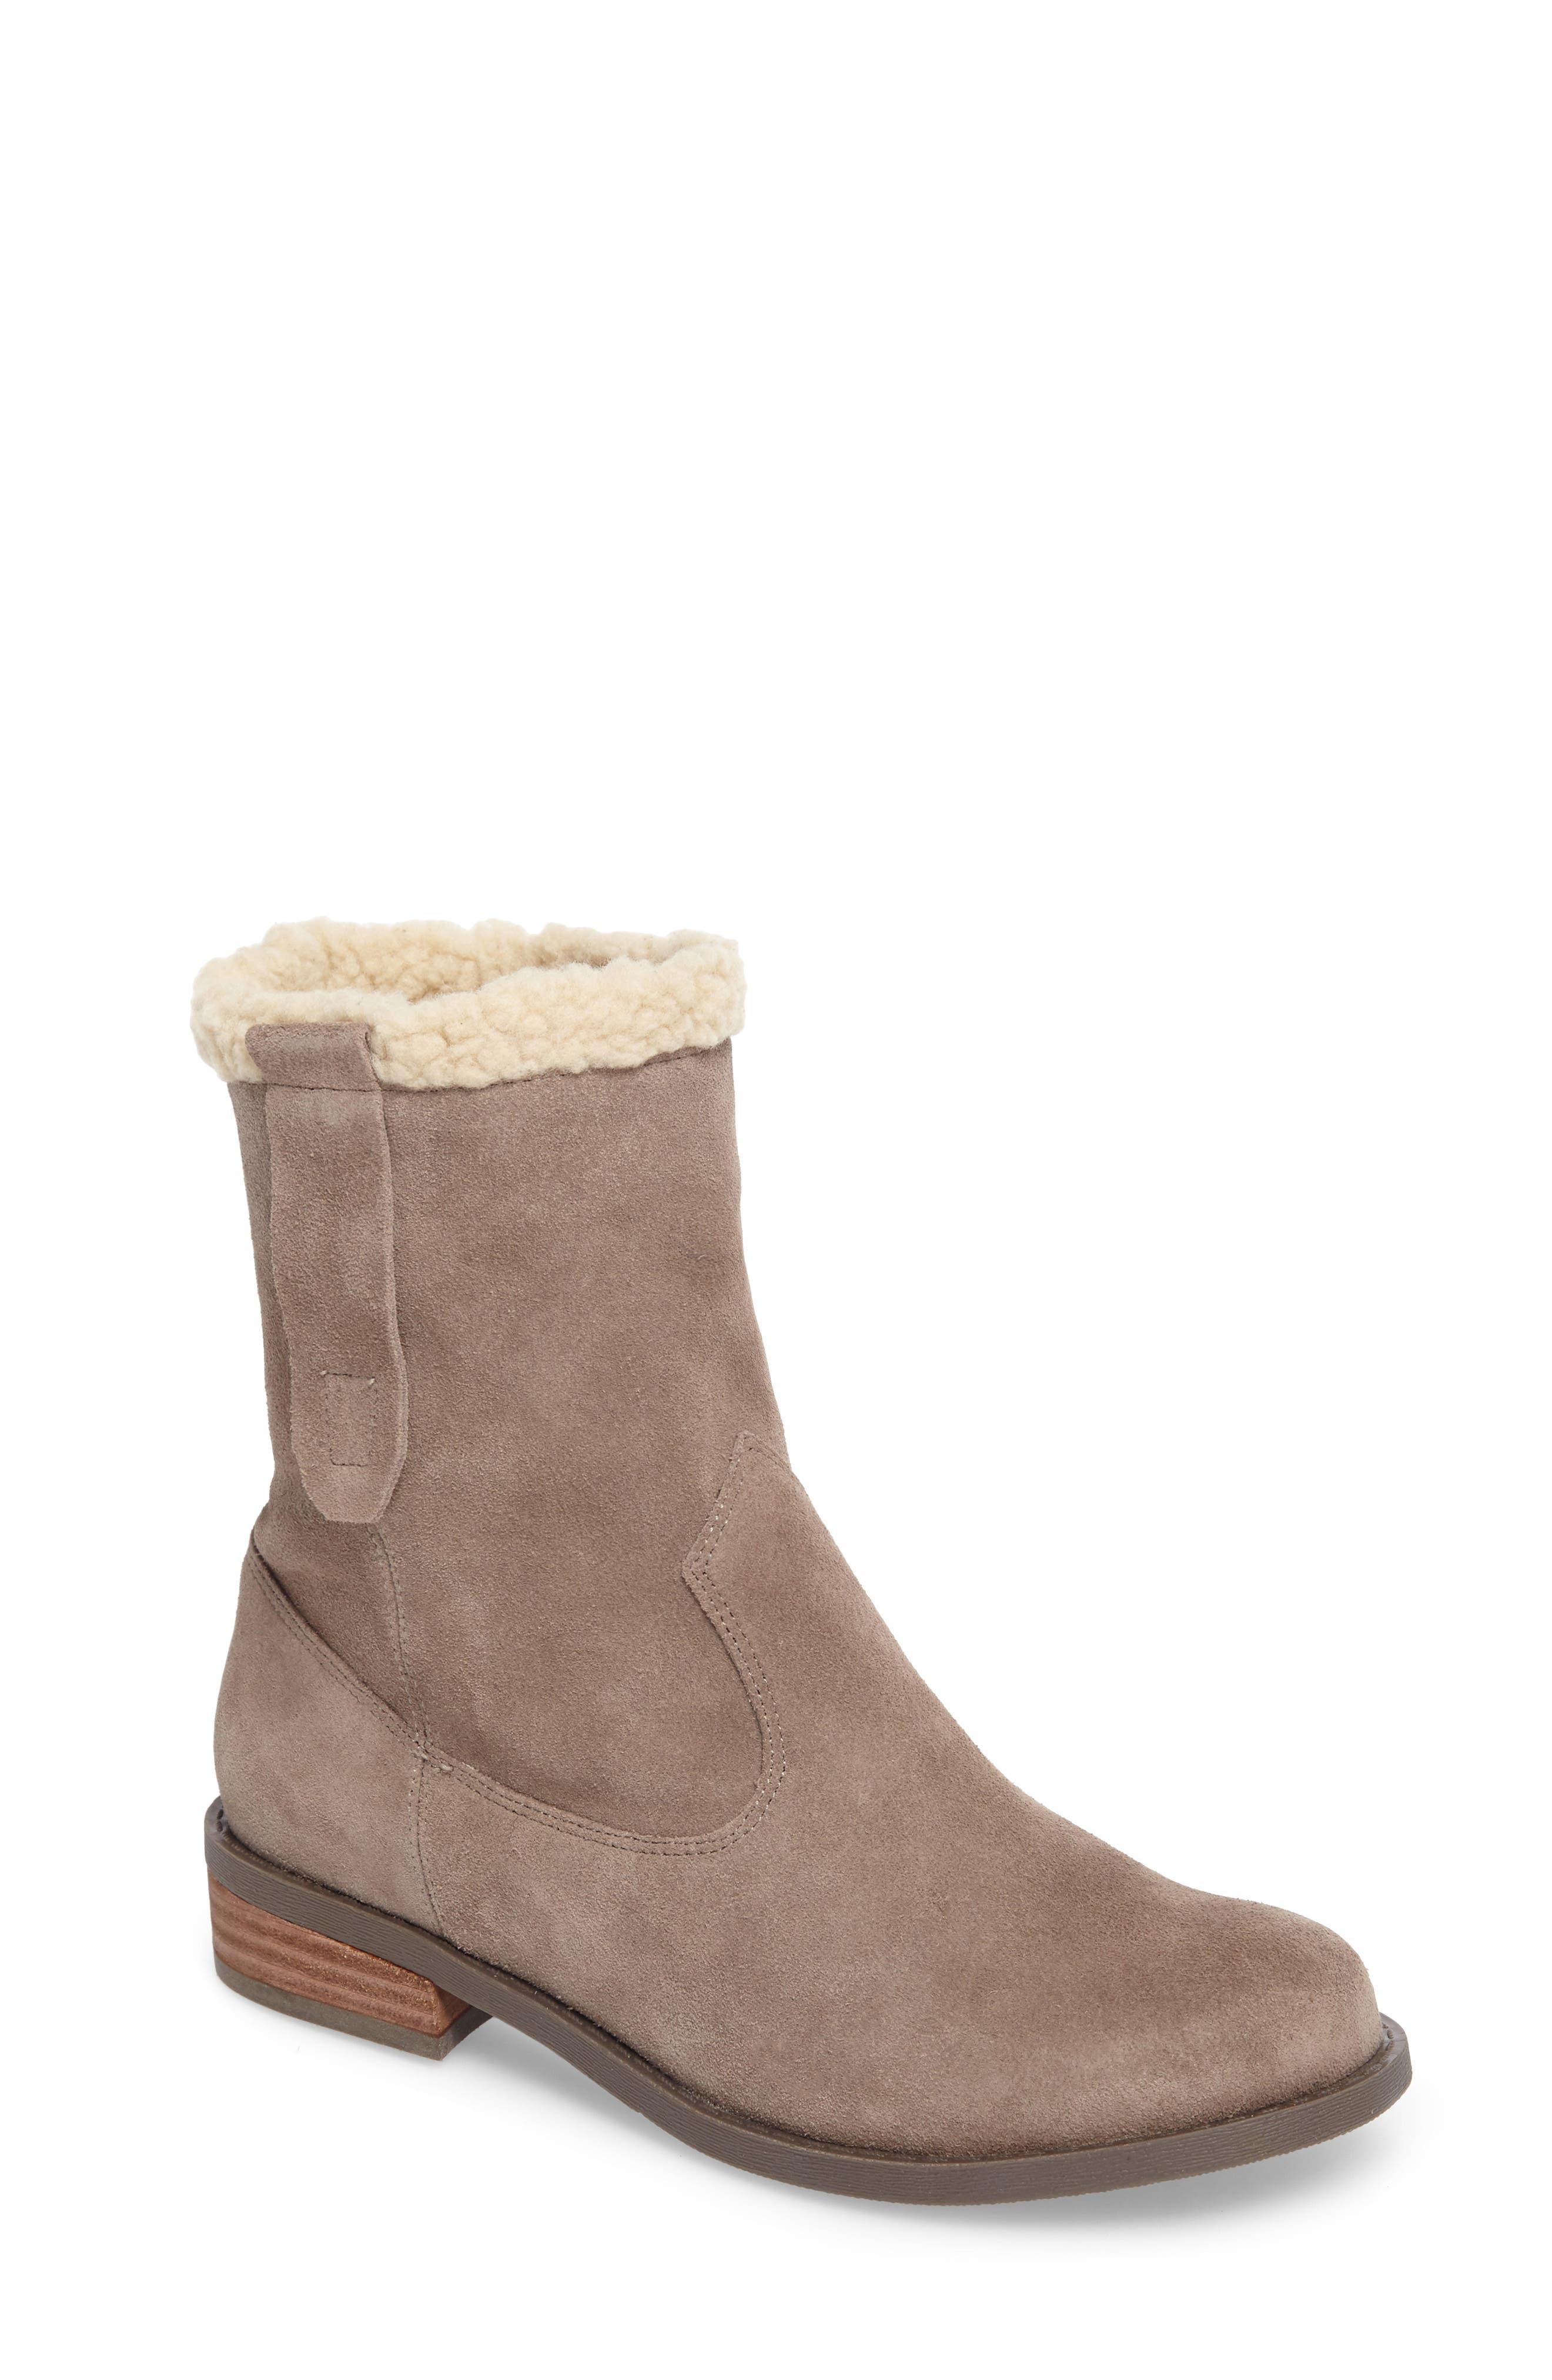 Verona Faux Shearling Boot,                         Main,                         color, Dark Mushroom Suede